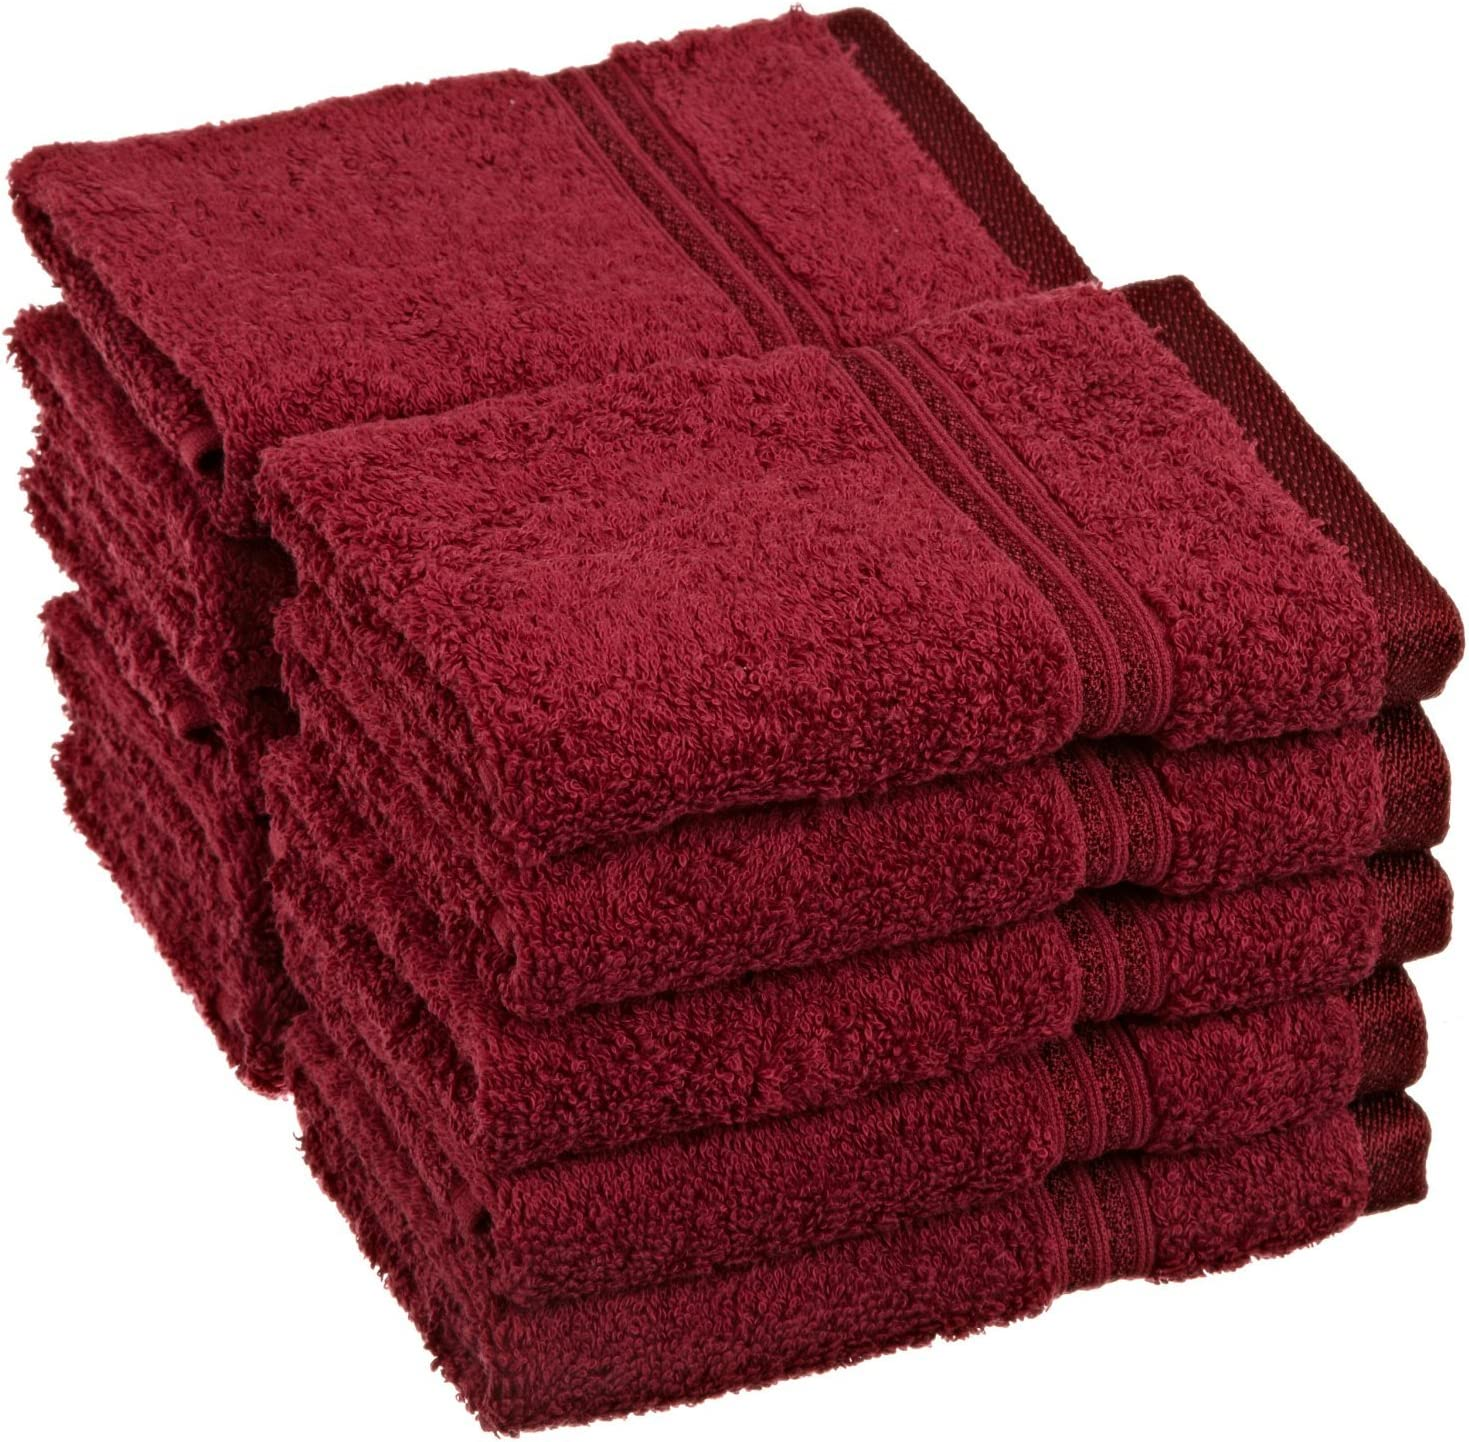 SUPERIOR 10-Piece 600 GSM San Diego Mall Egyptian Set Cotton Face Towel Choice Burgun